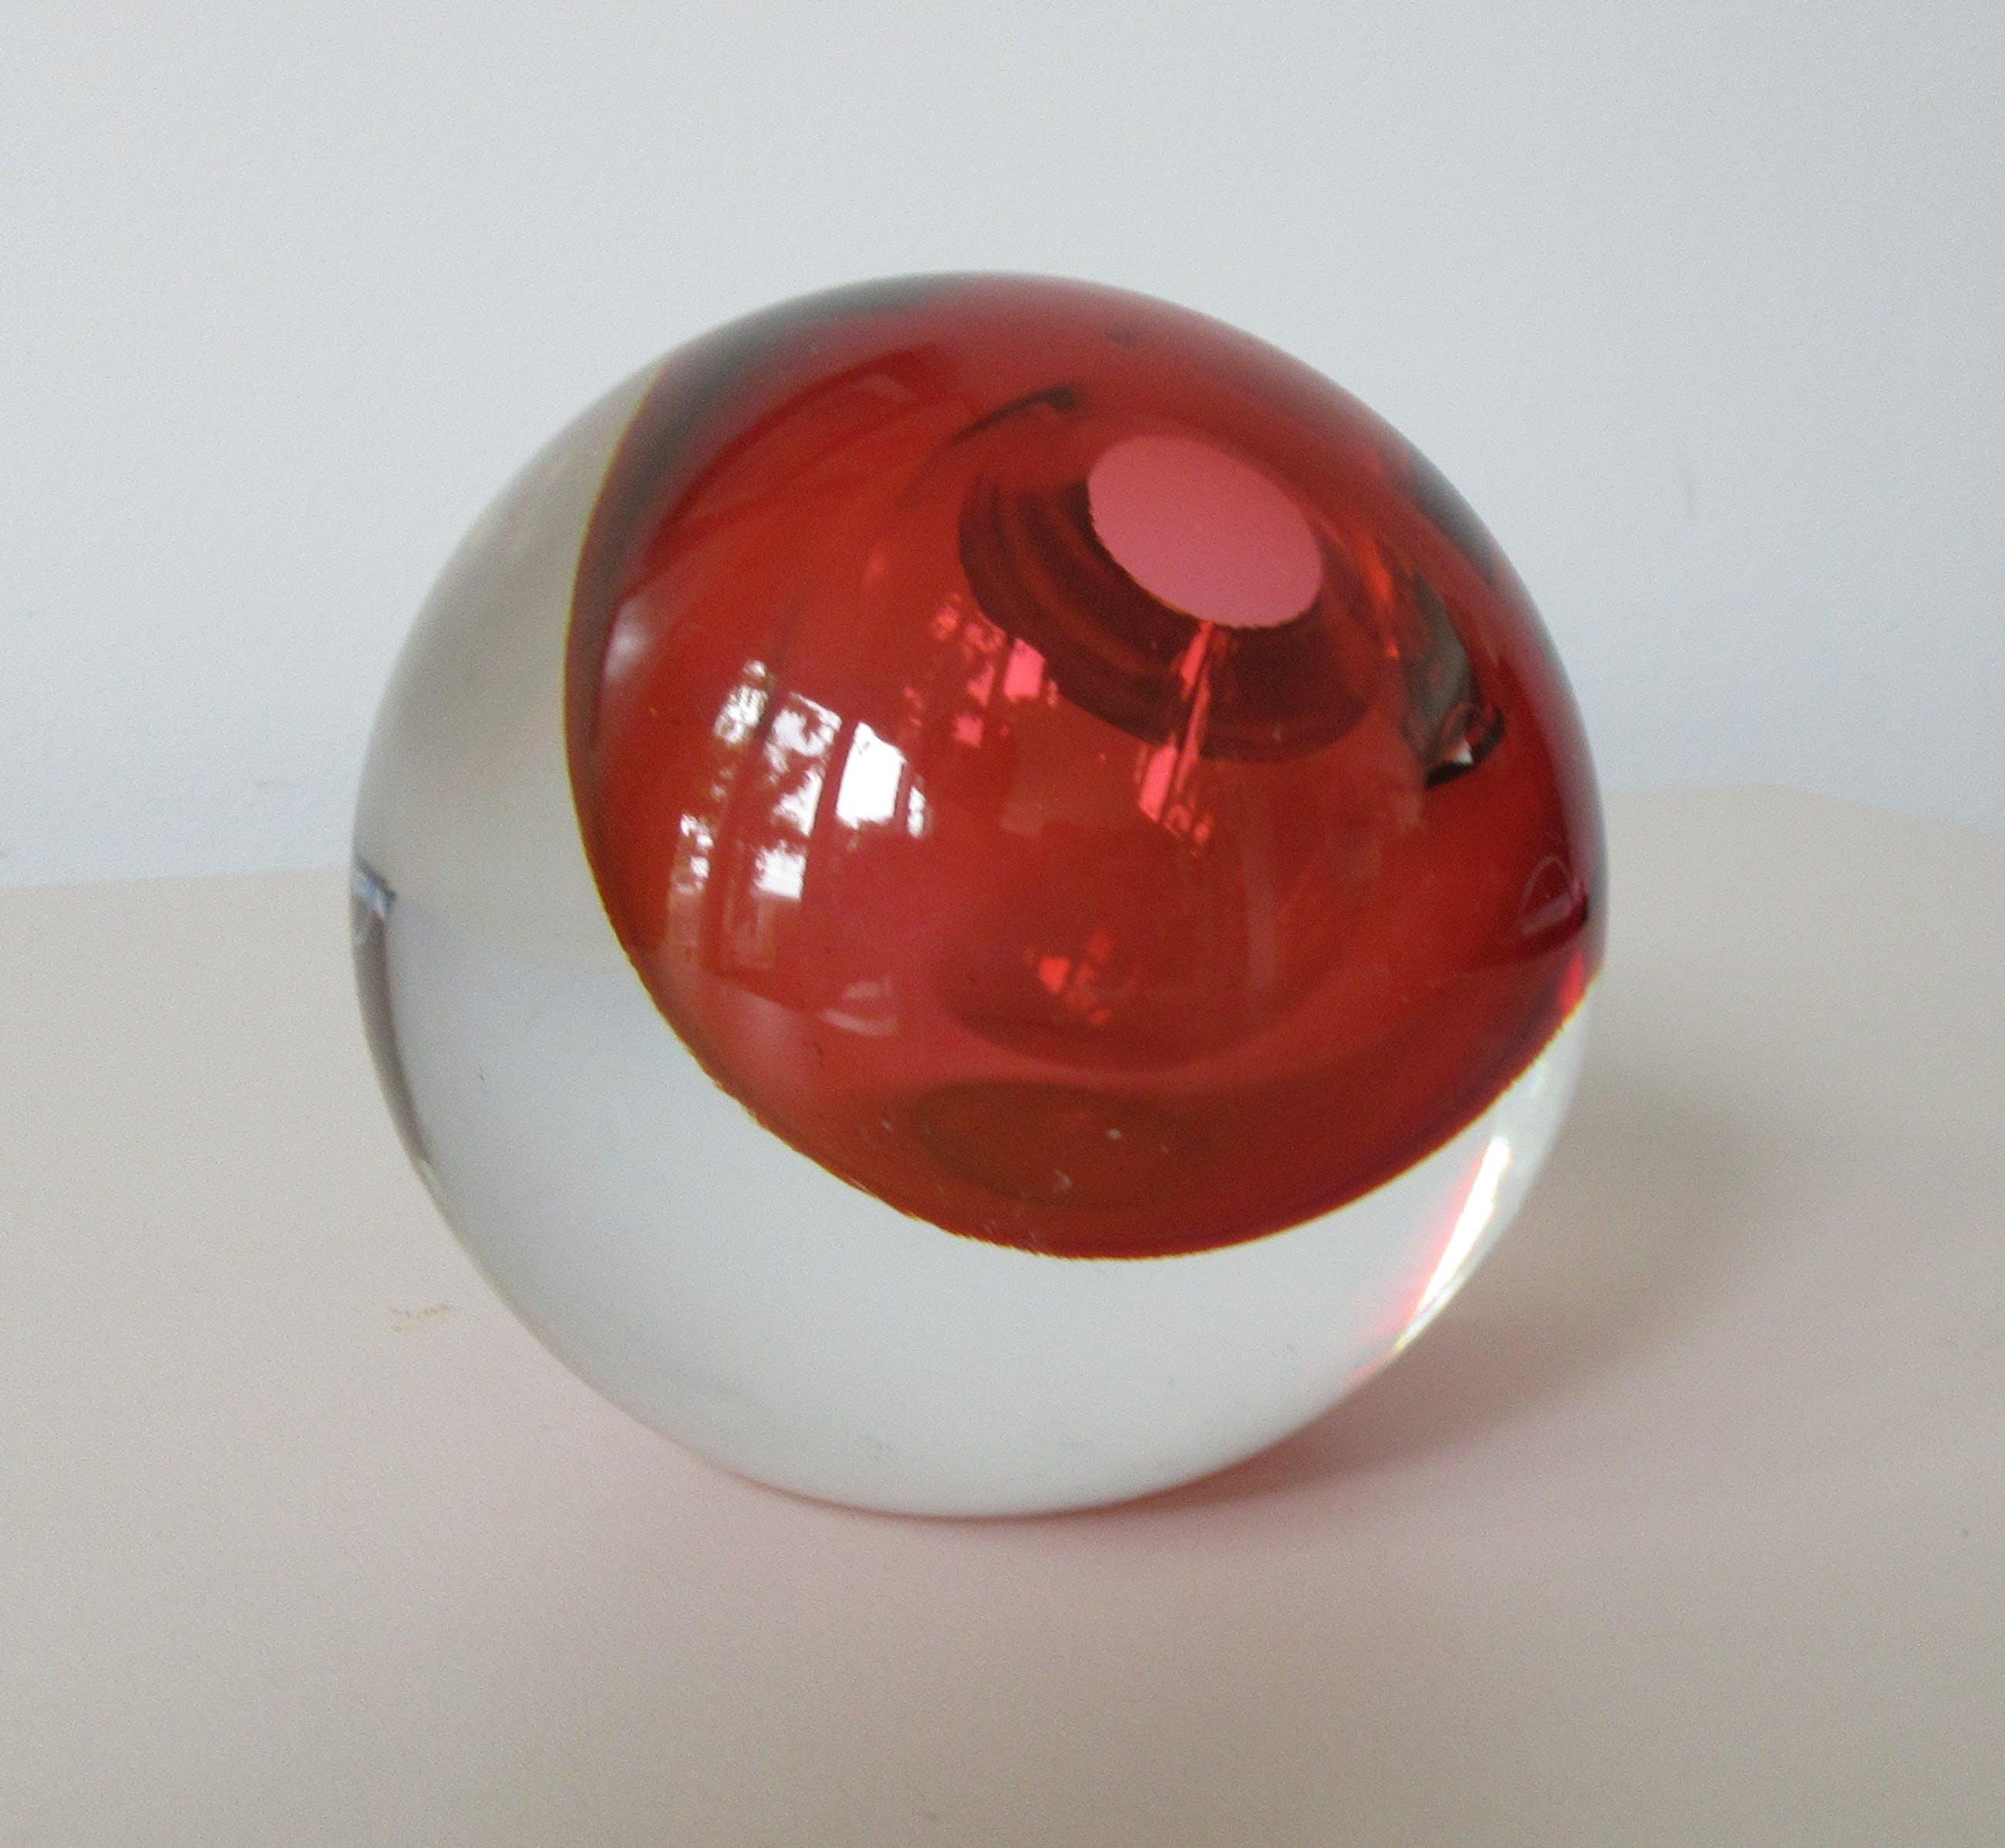 Princ art glass - Glazen object kopen? Bied vanaf 40!